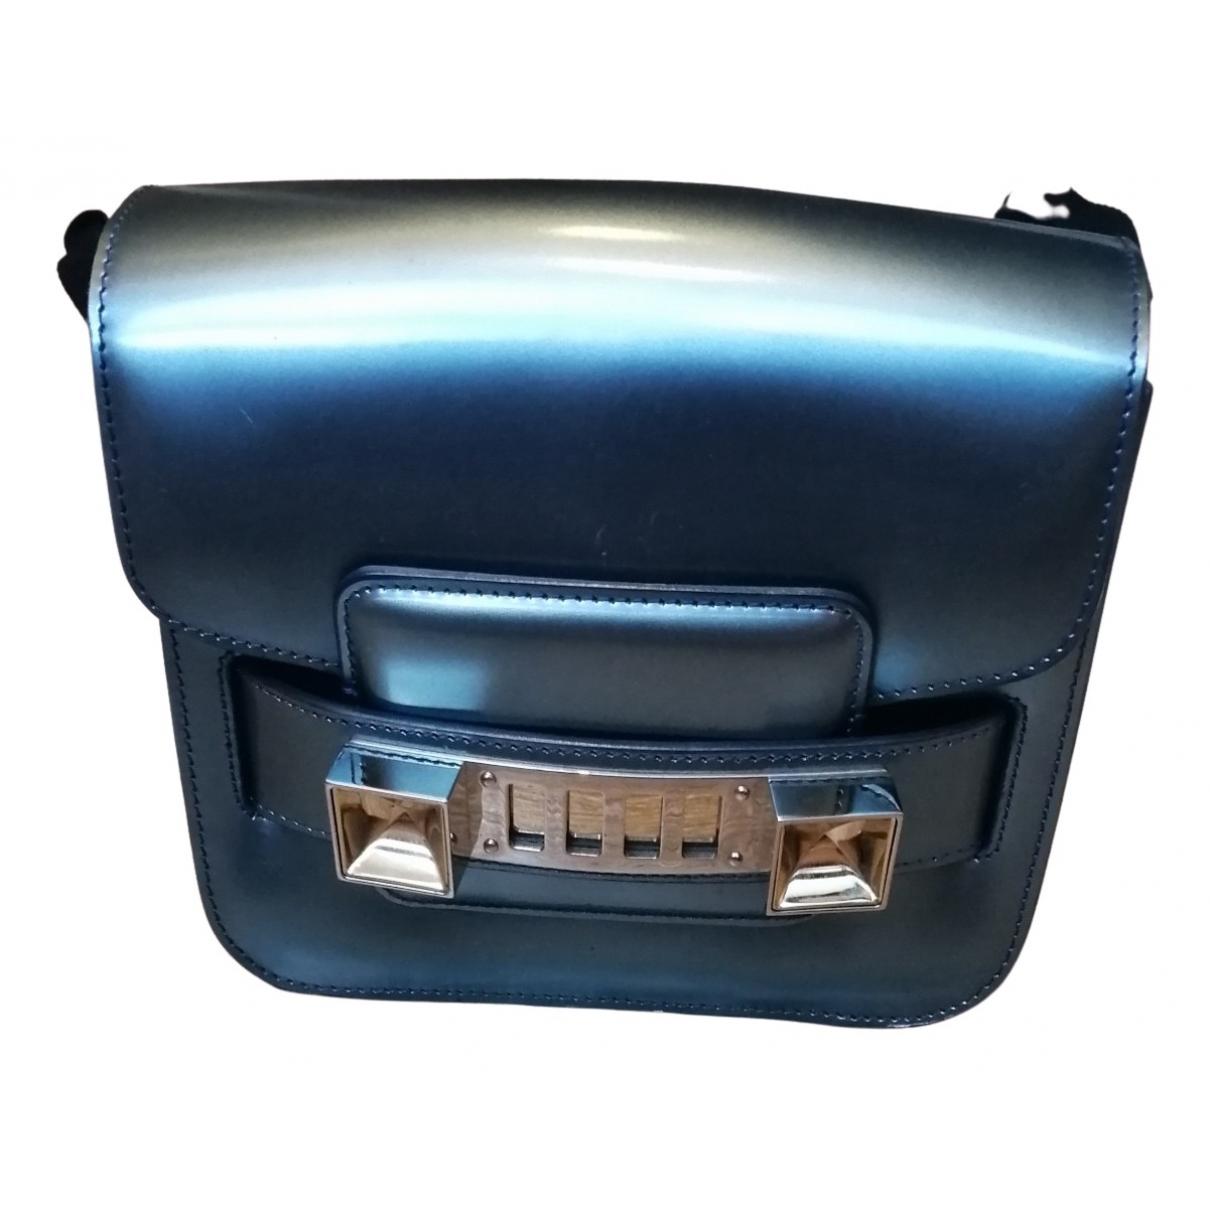 Proenza Schouler - Sac a main PS11 pour femme en cuir verni - metallise